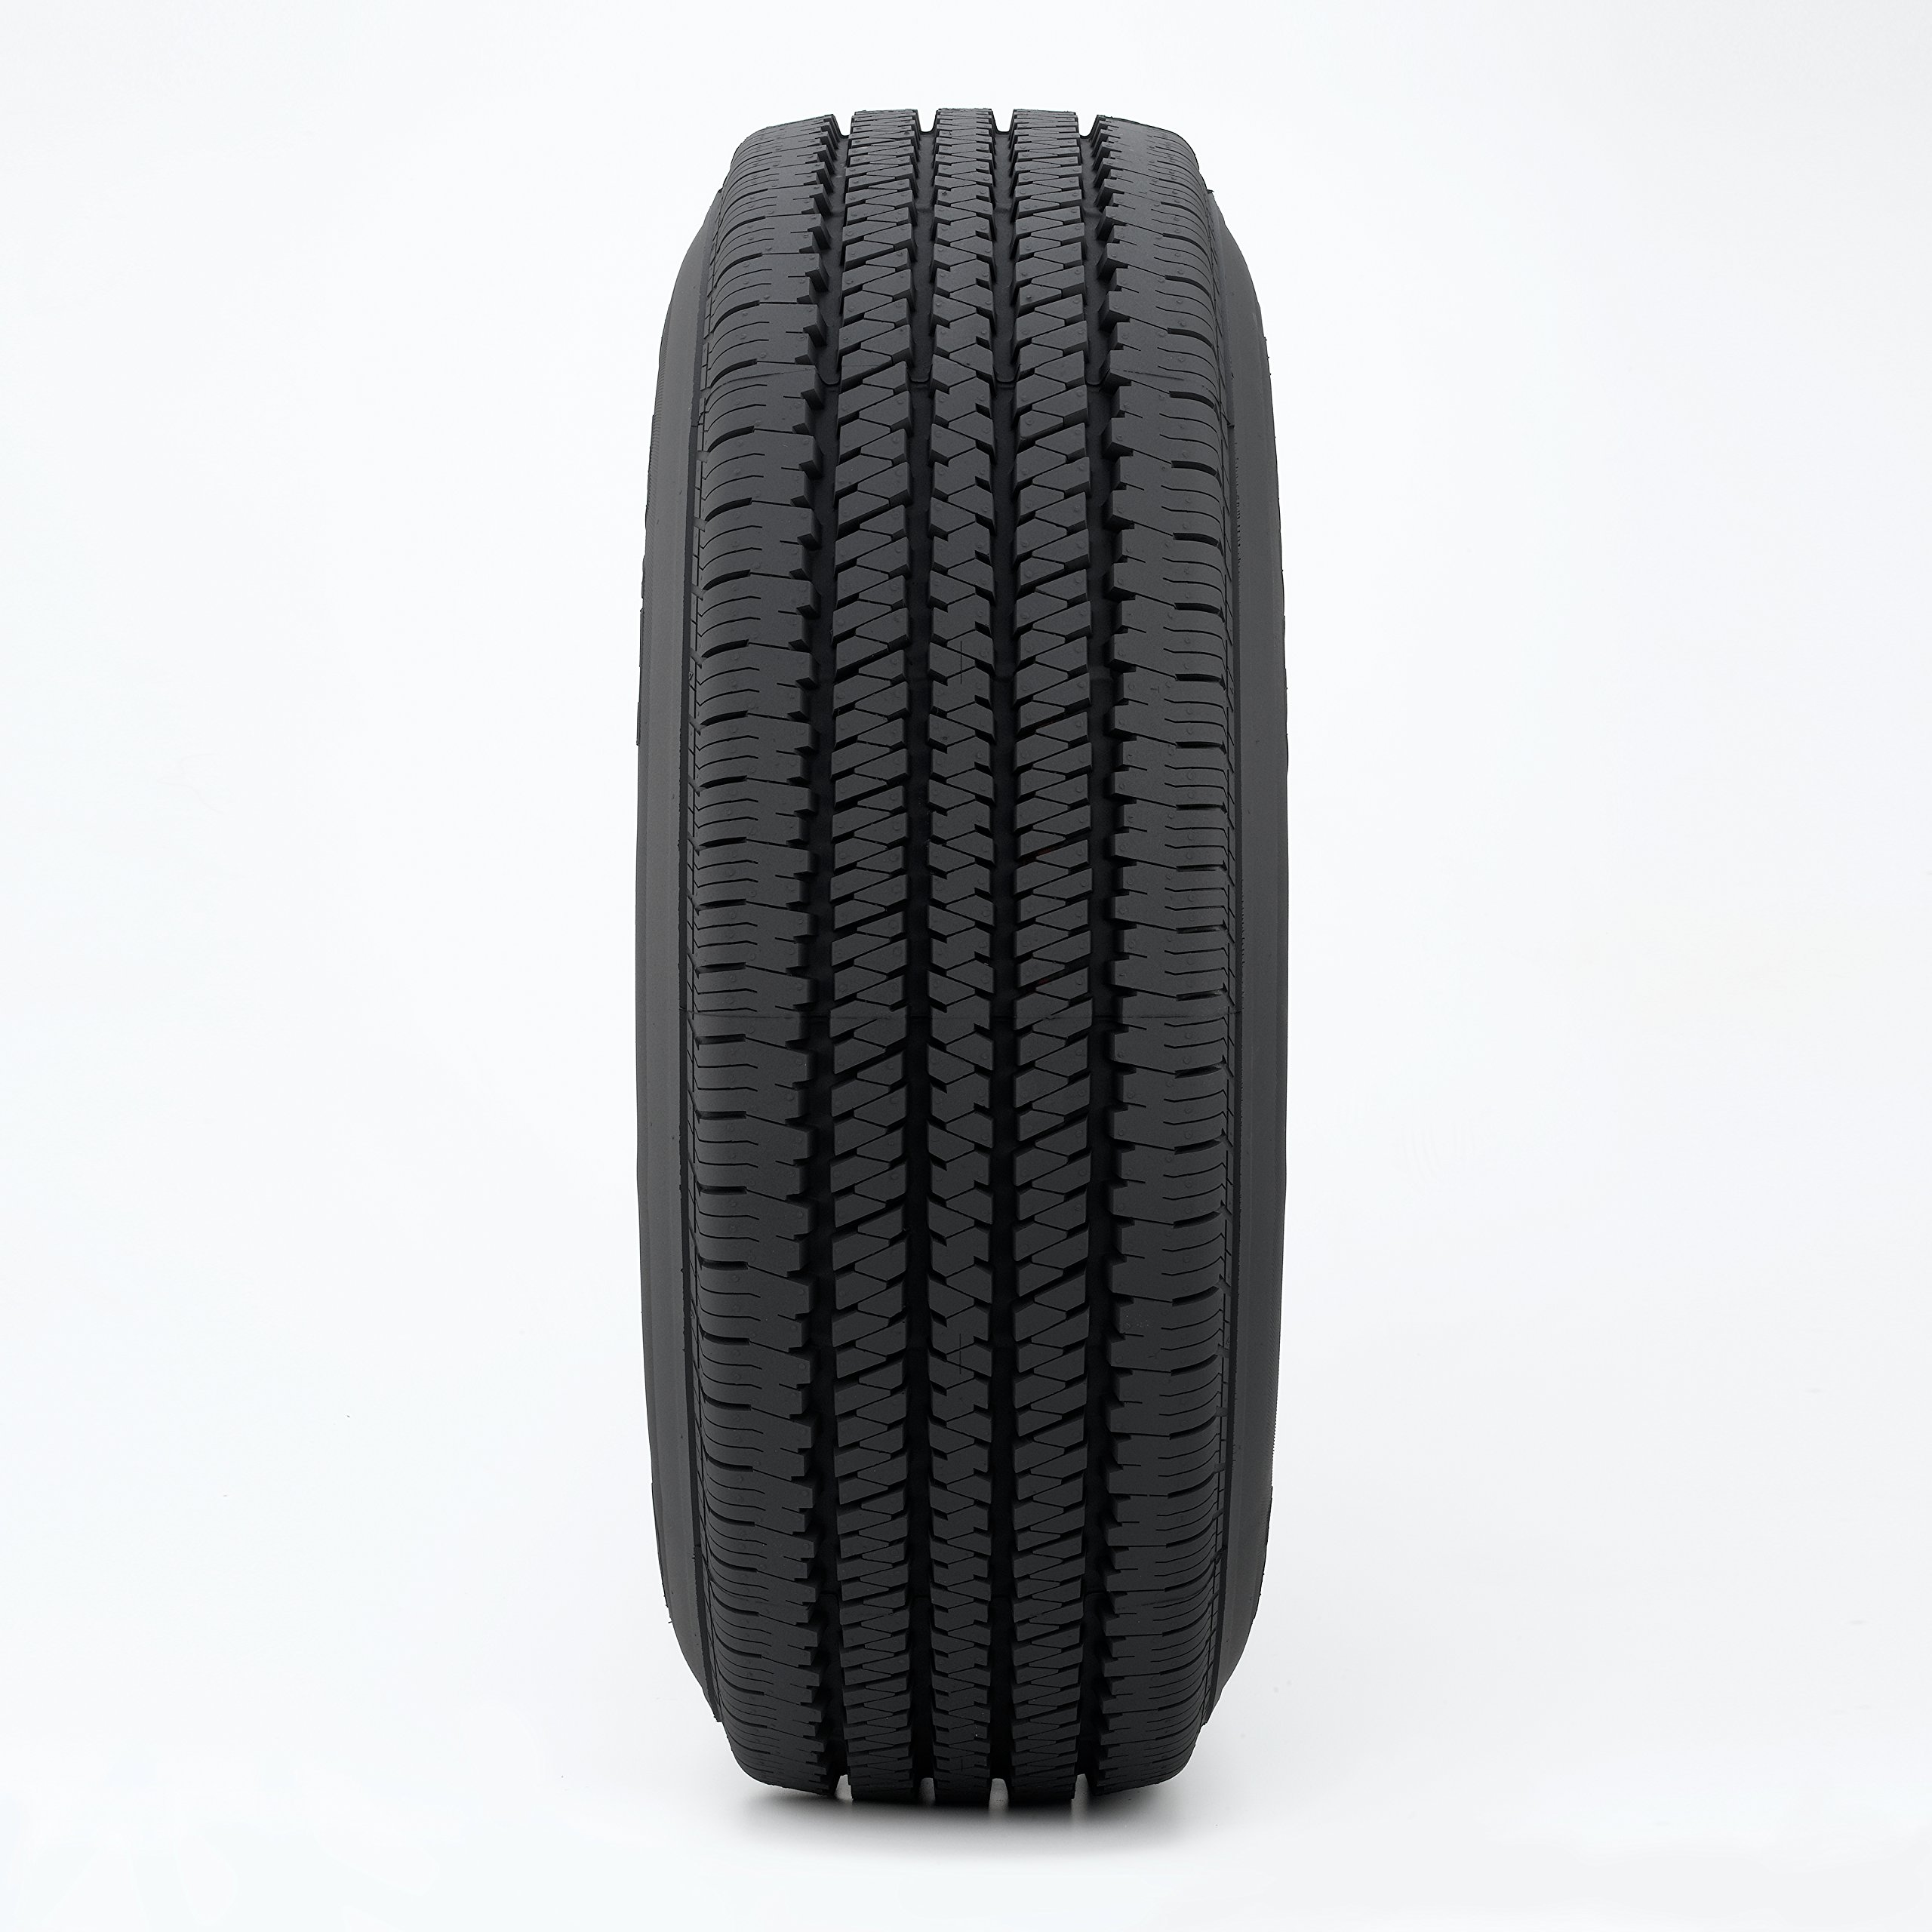 Bridgestone Dueler H/T 684 II All-Season Radial Tire - 255/70R18 112T by Bridgestone (Image #4)